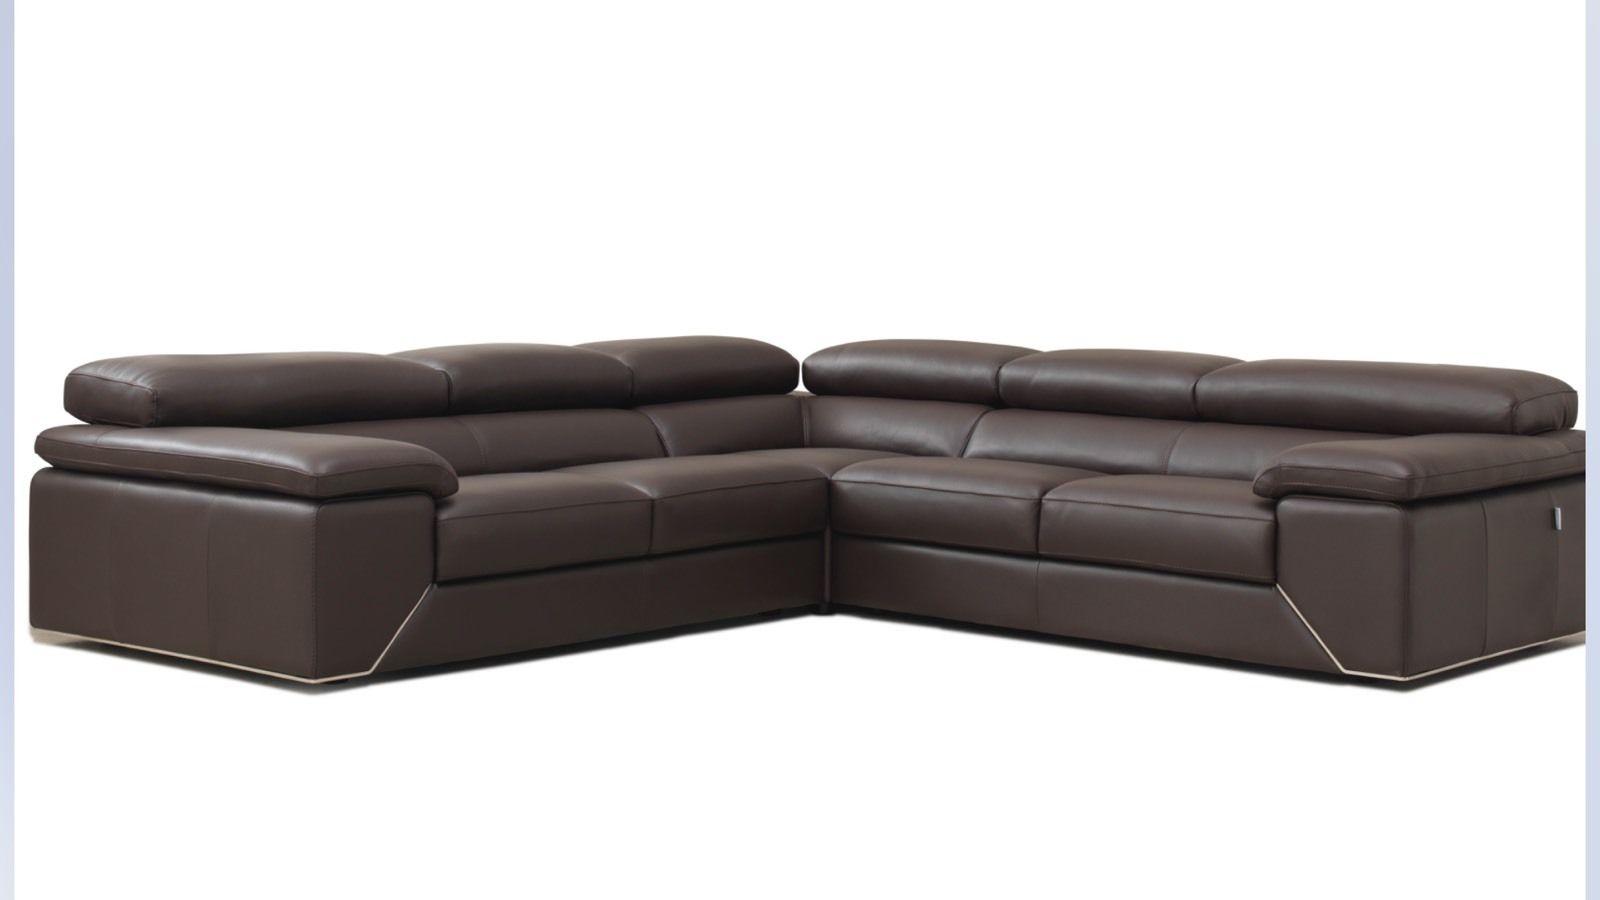 italian modern sofas uk sofascore sign in concept italia designer leather corner sofa brown